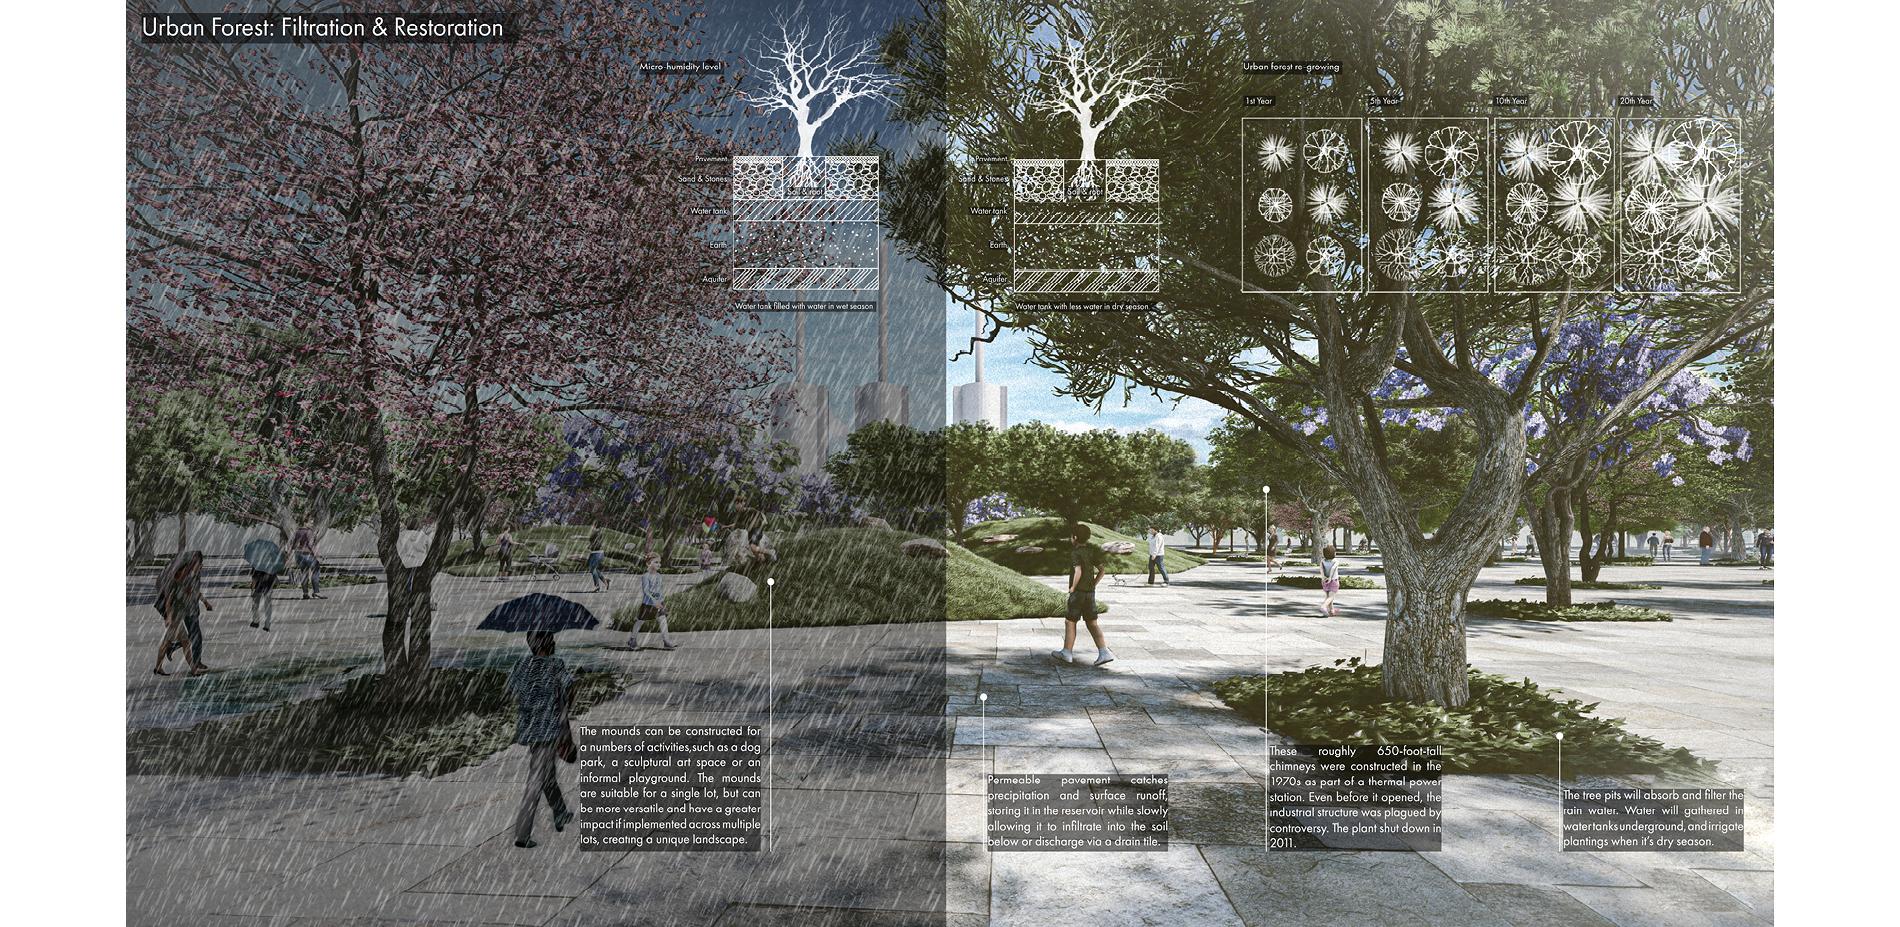 Urban Forest: Filtration & Restoration